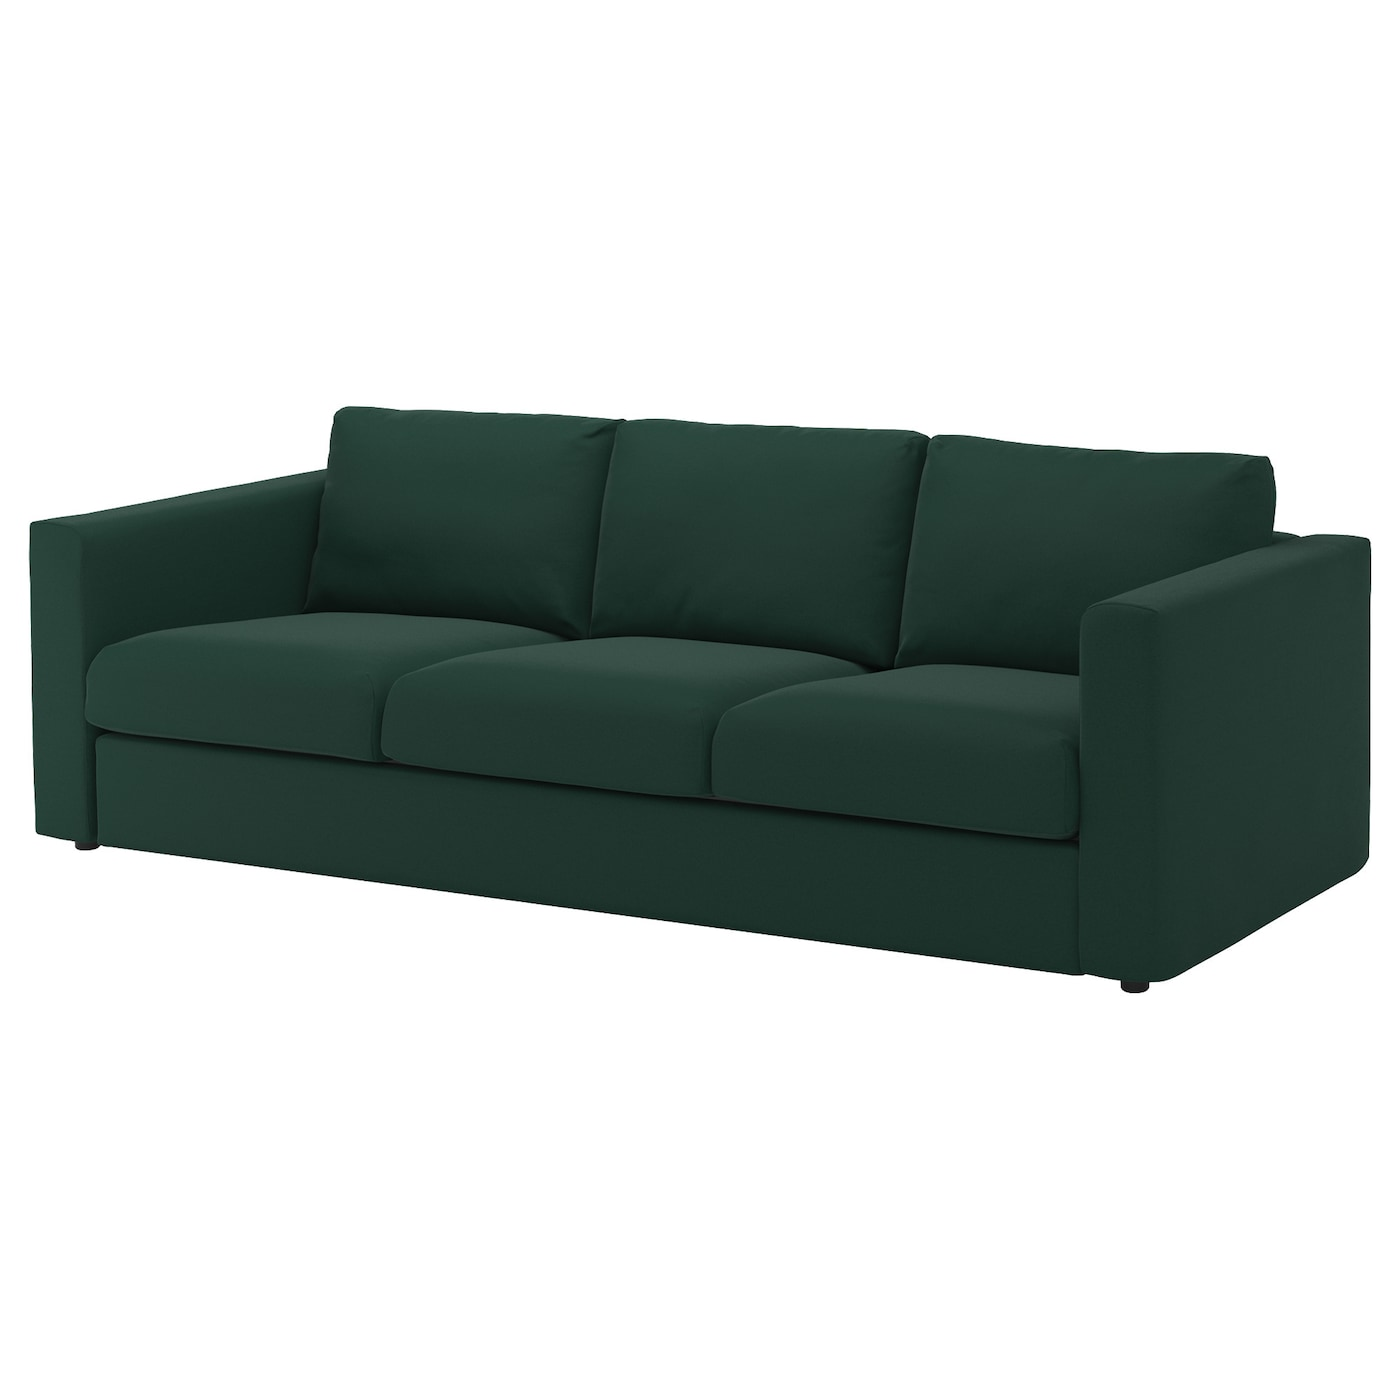 3 Seat Sofa Cover